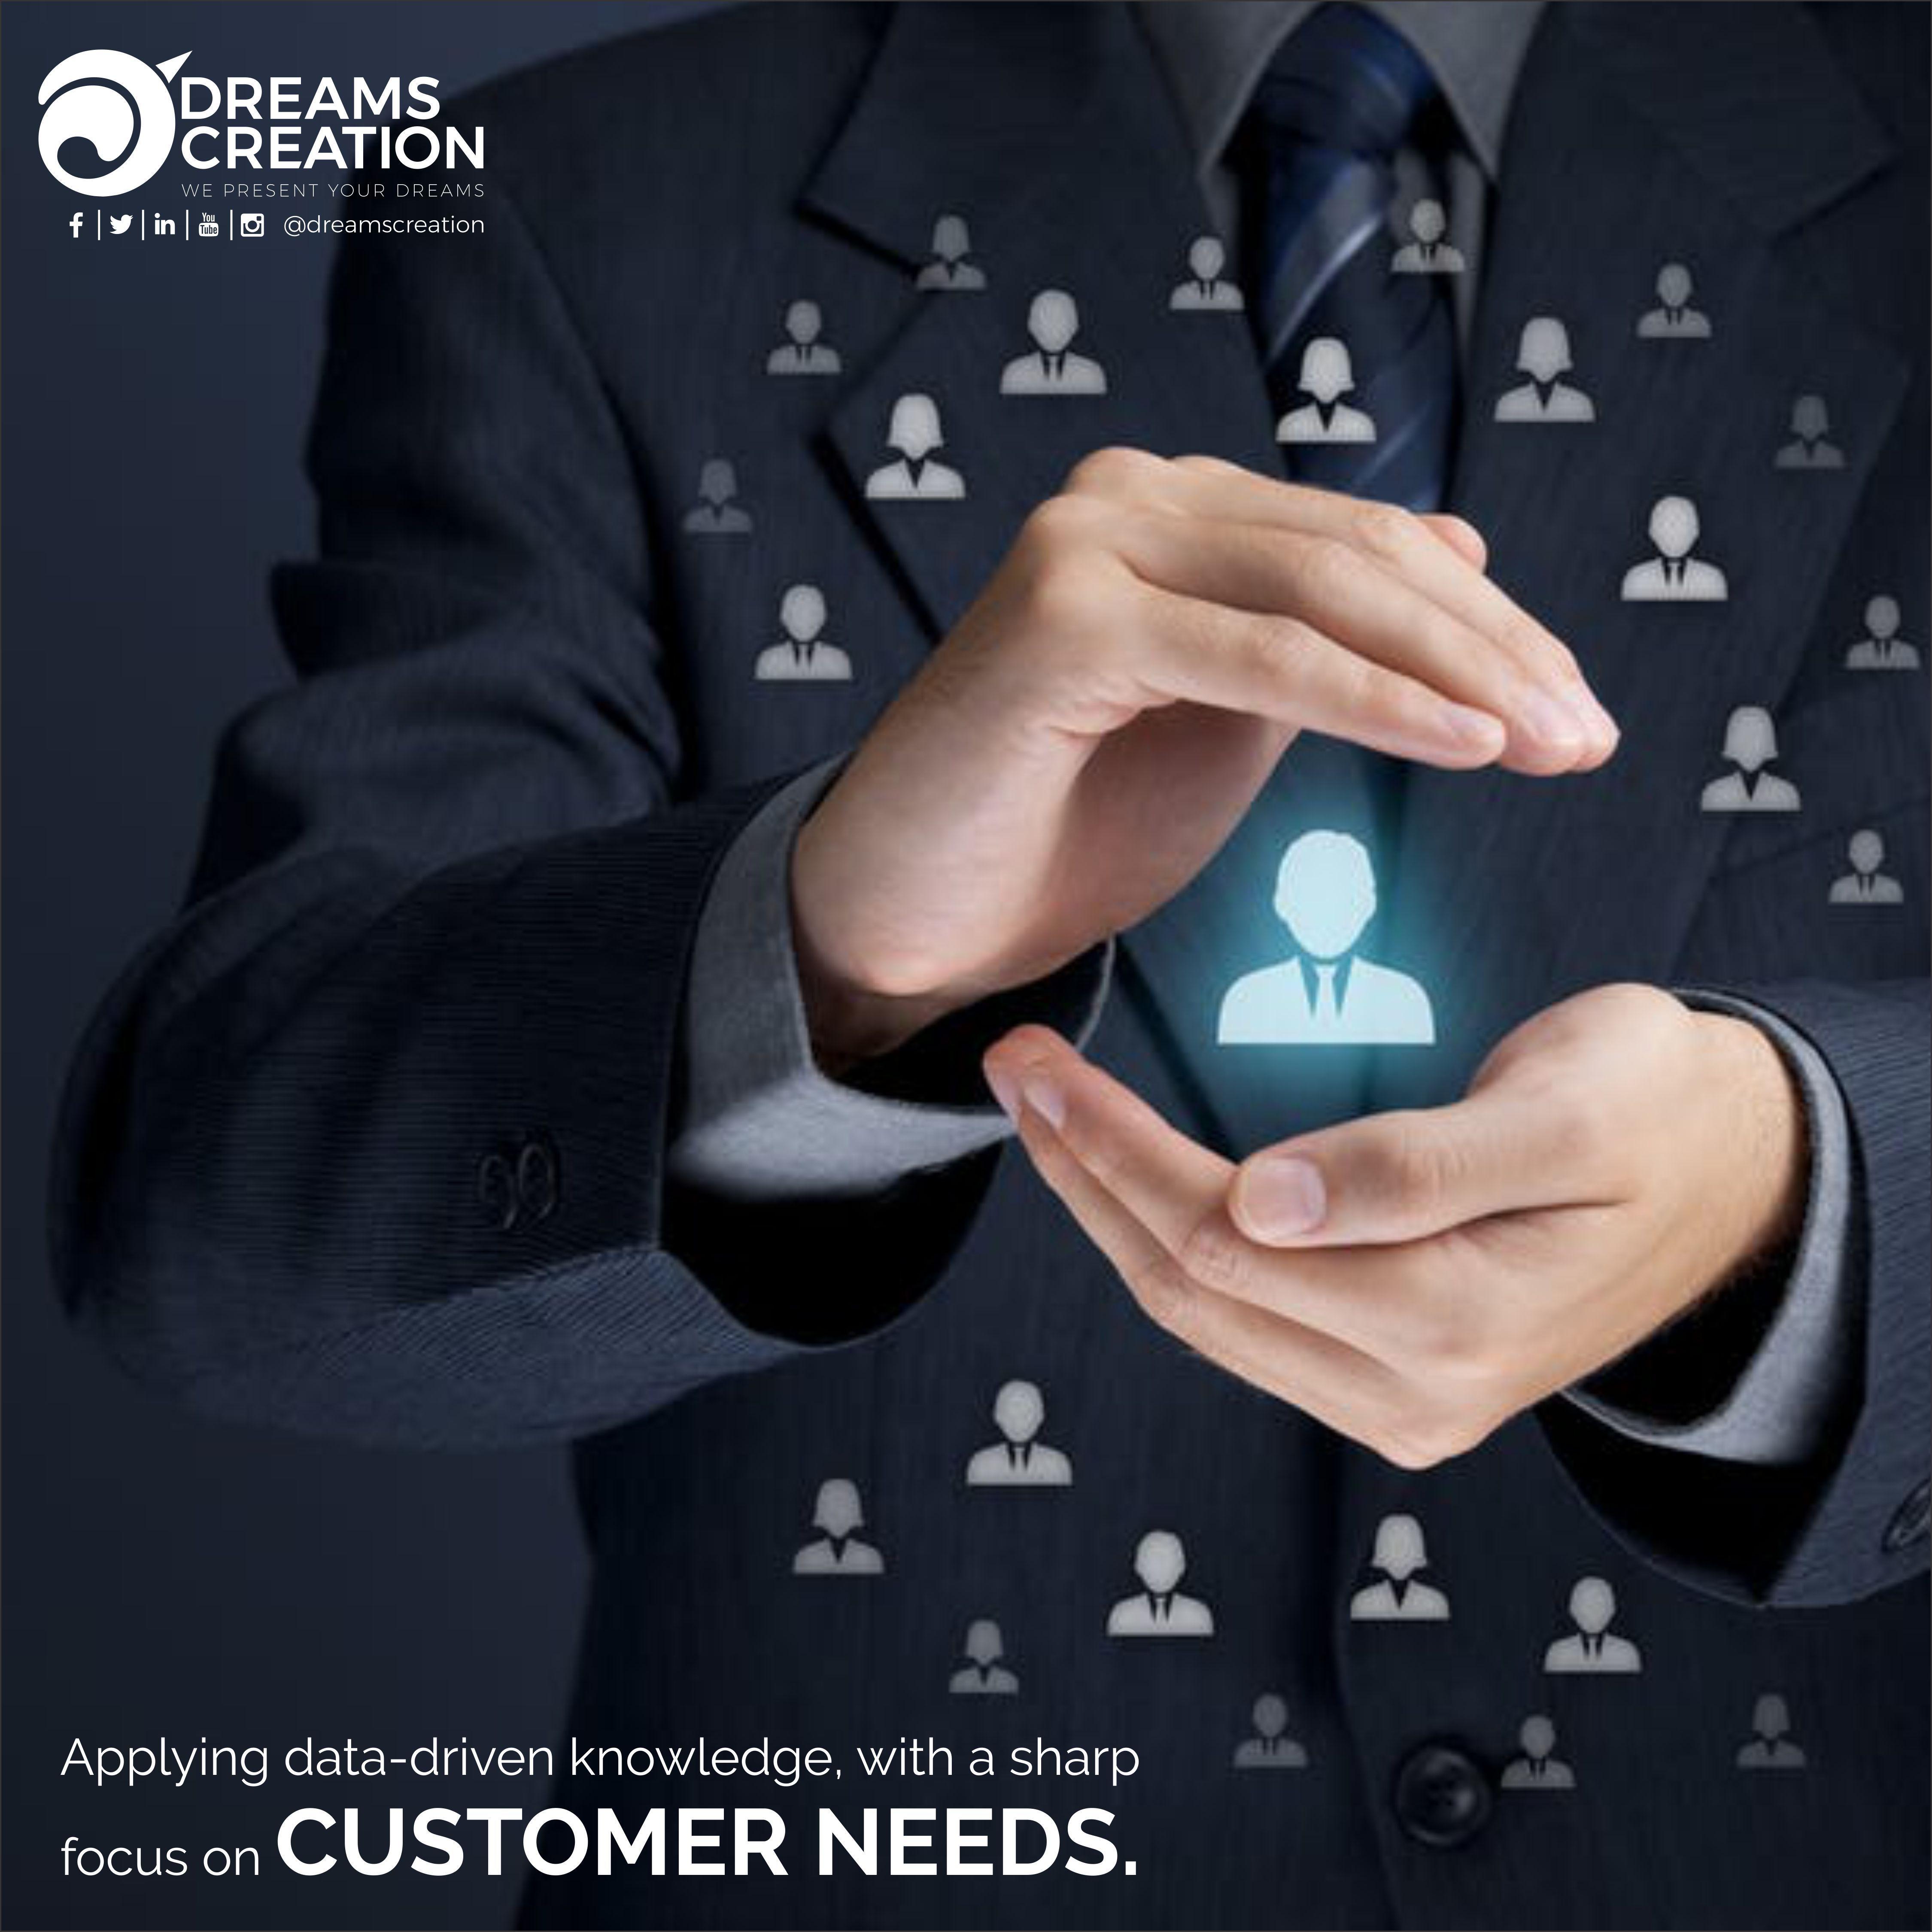 Dreams creation advertising branding marketing